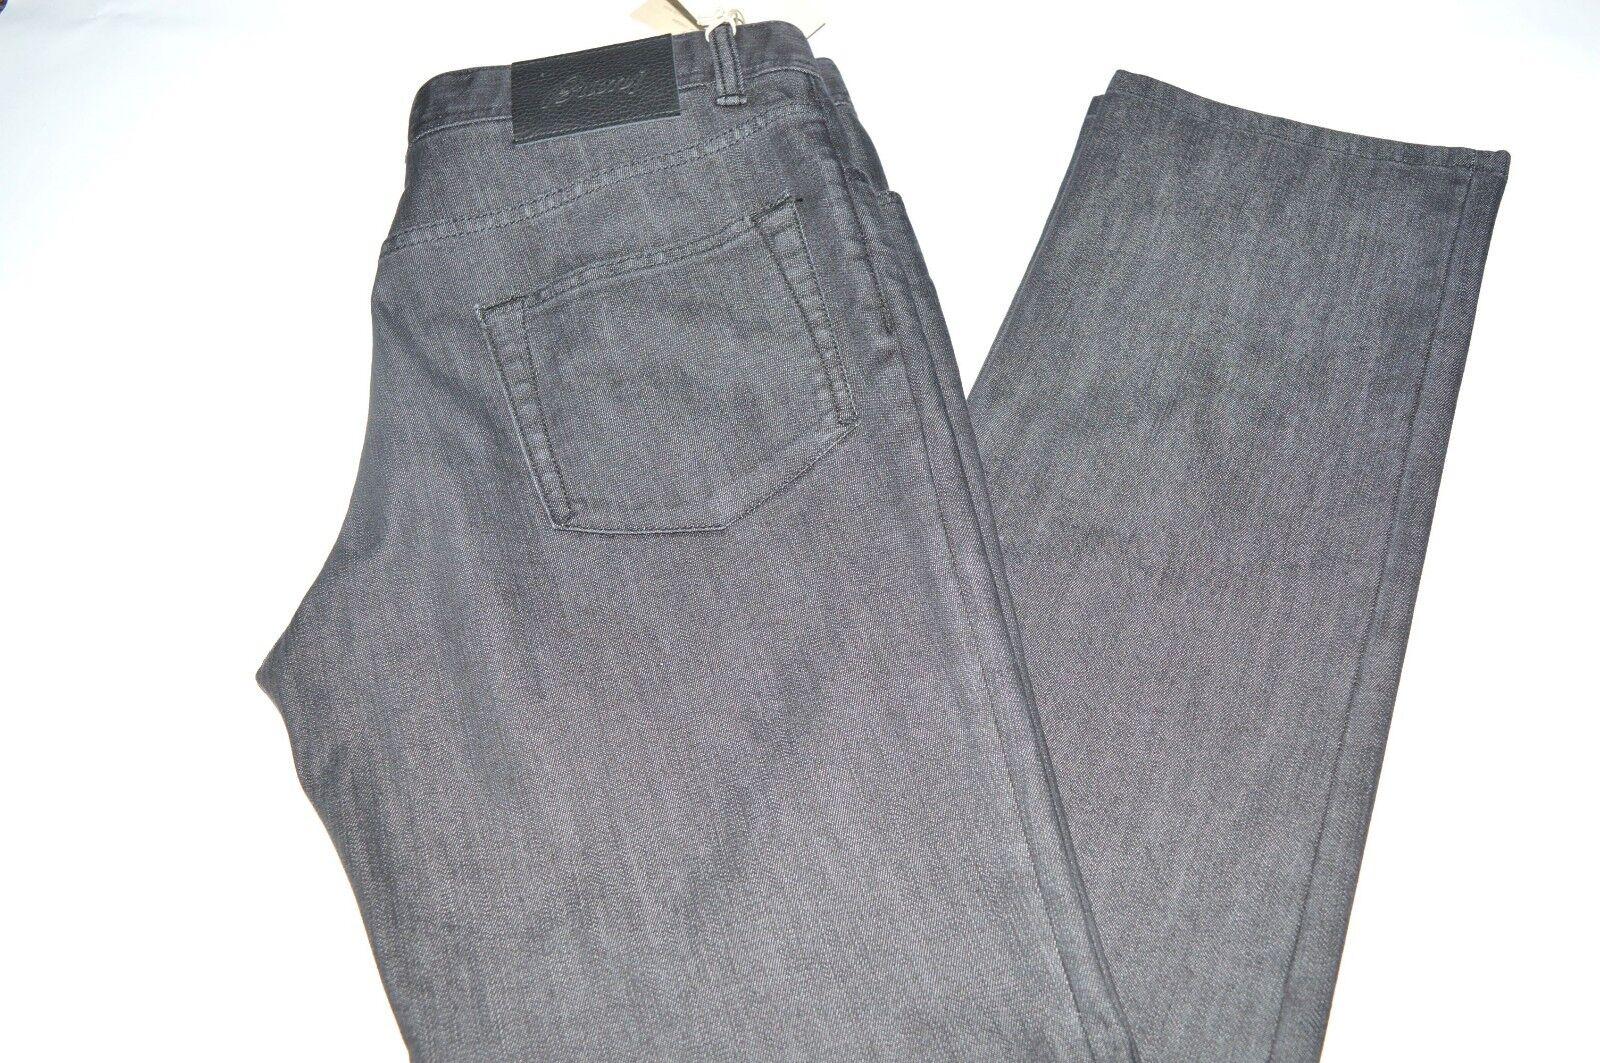 NEW BRIONI Jeans -Livigno 1000 170- 80% Cotton 20% Elastane Size 37 Us 53  Eu